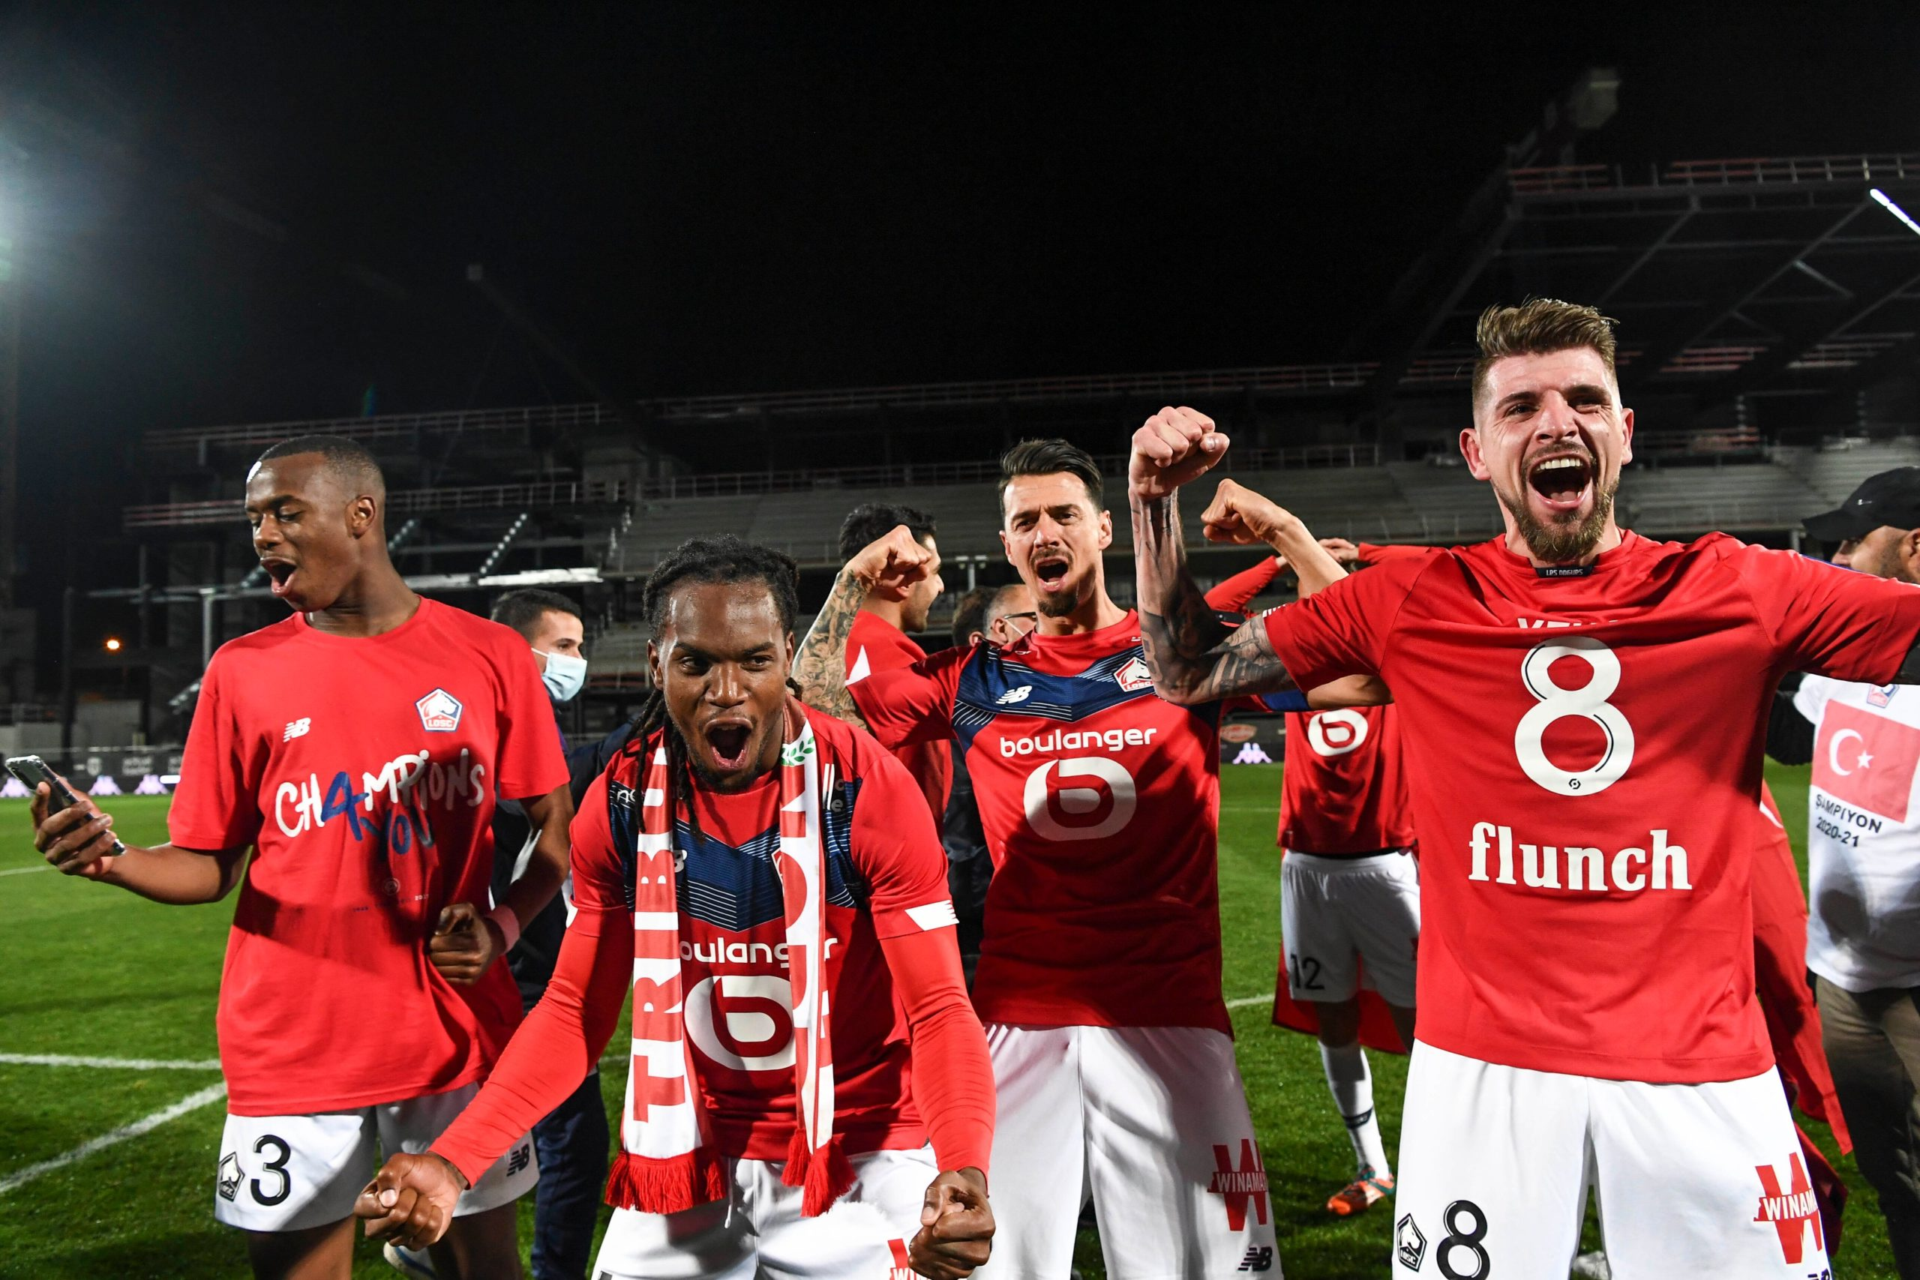 Lille Campeão